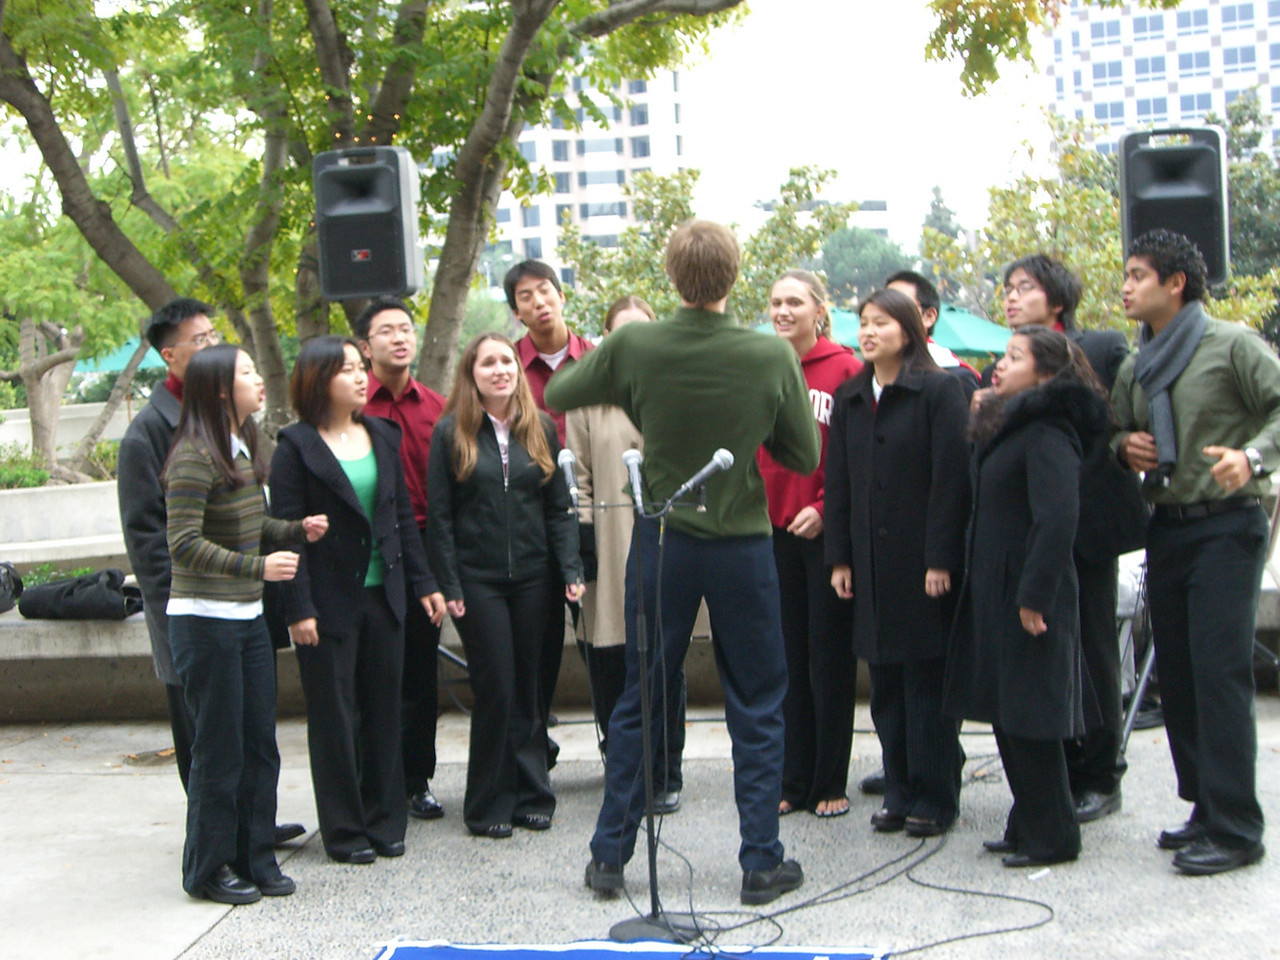 2005 12 18 Sun - Lake Ave Church - Rob Majors takes over conducting Jingle Bells